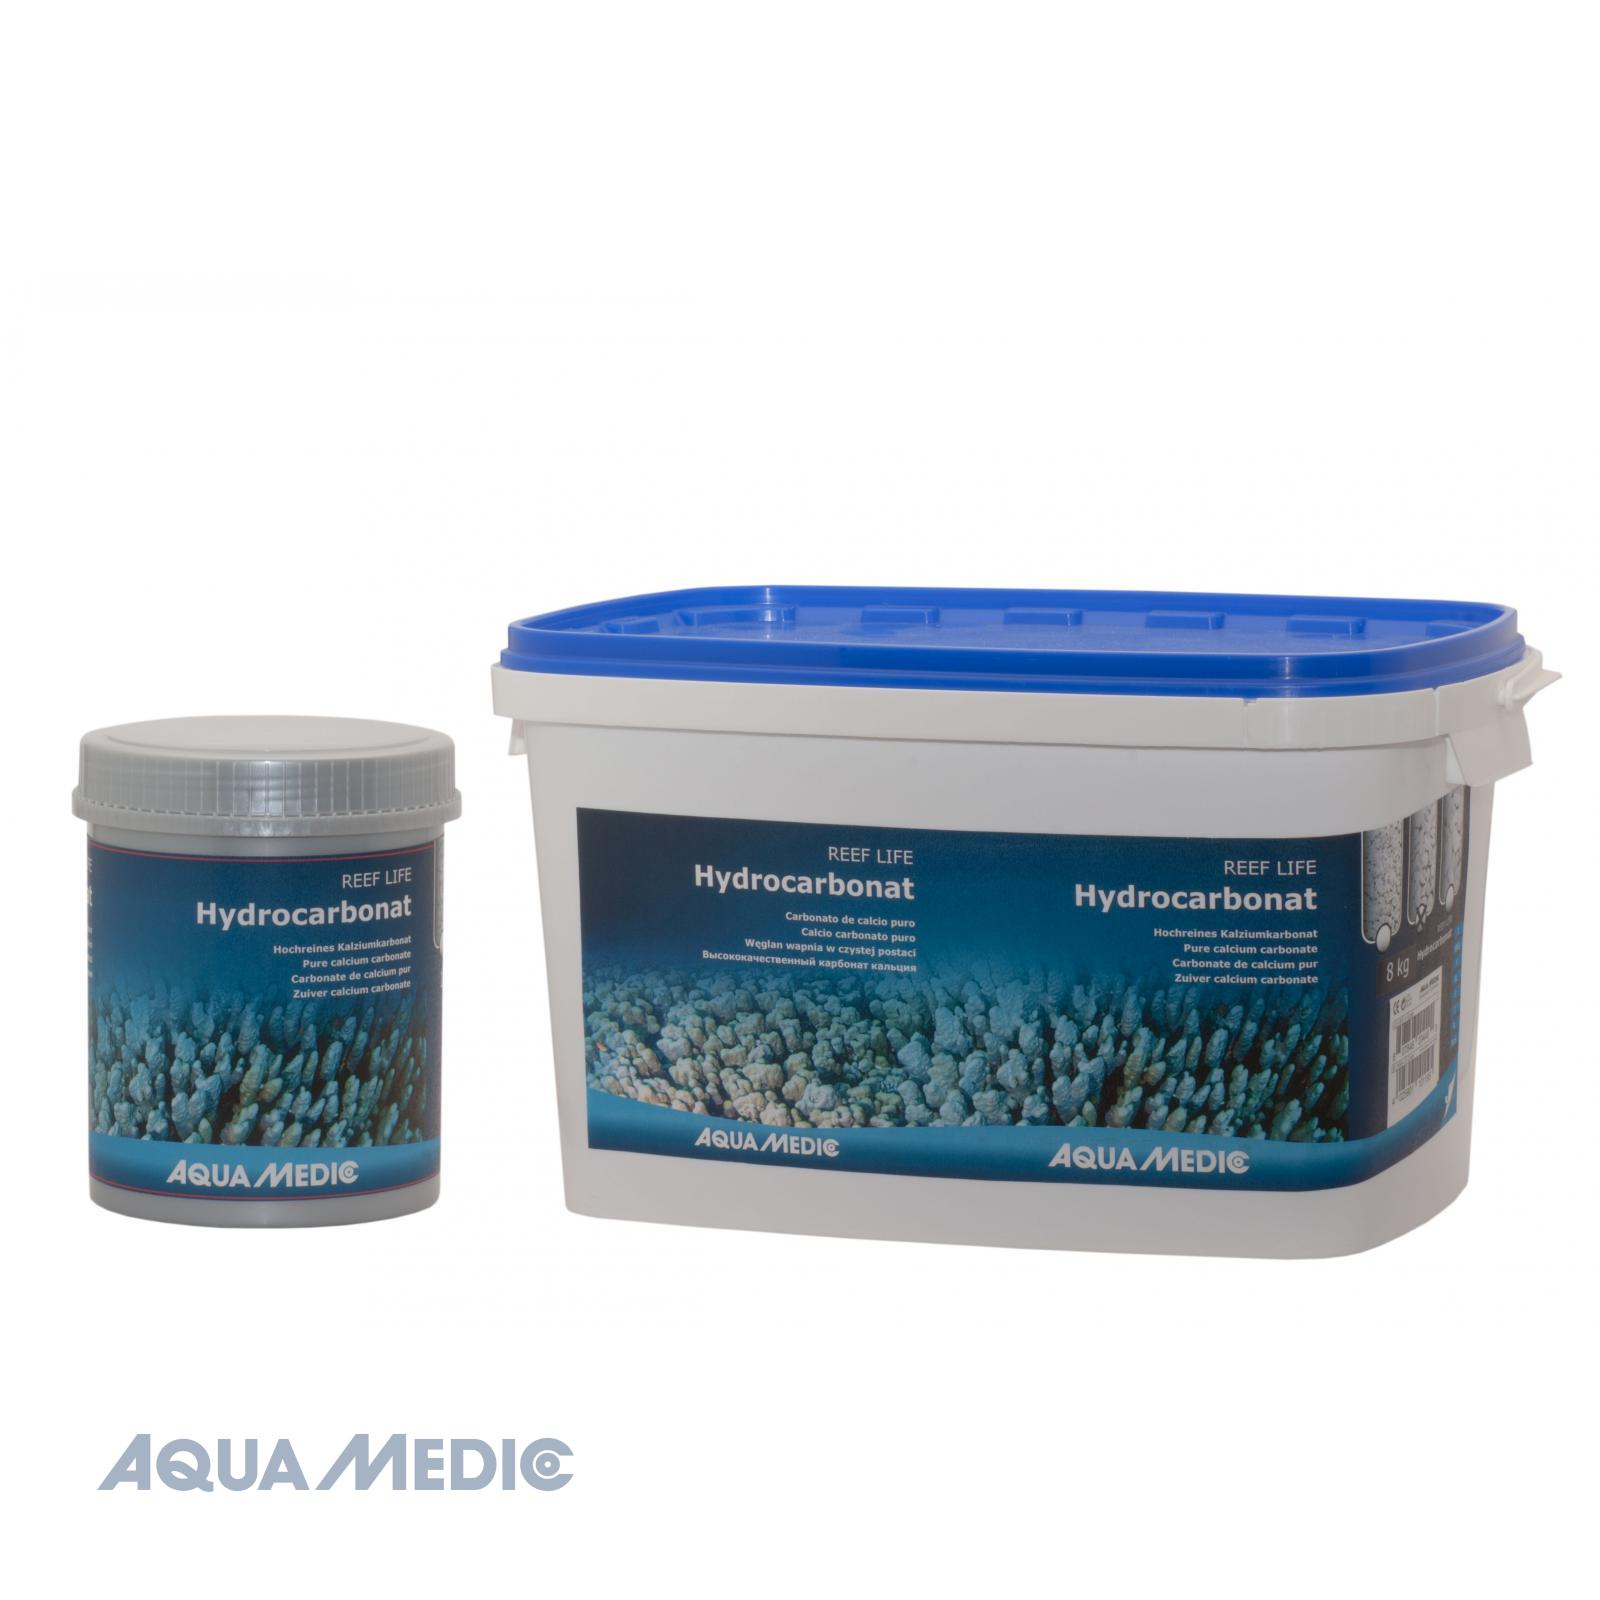 Aquamedic Hydrocarbonate